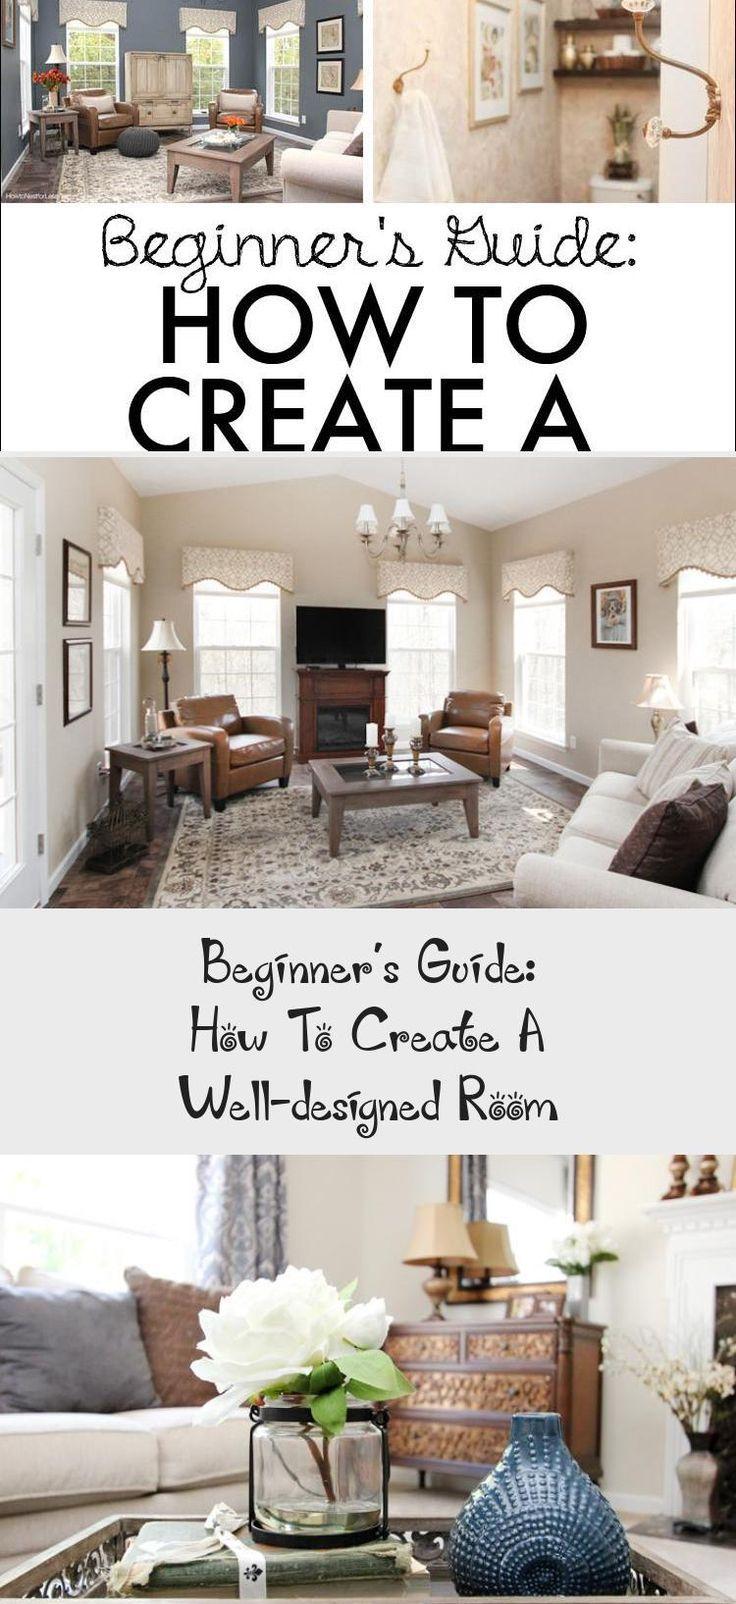 #interiordesignTips  #interiordesignShop  #interiordesignTrends  #interiordesignFurniture  #interiordesignRestaurant #Guide- #Make  Beginner's Guide- How to Make a Well-Designed Room